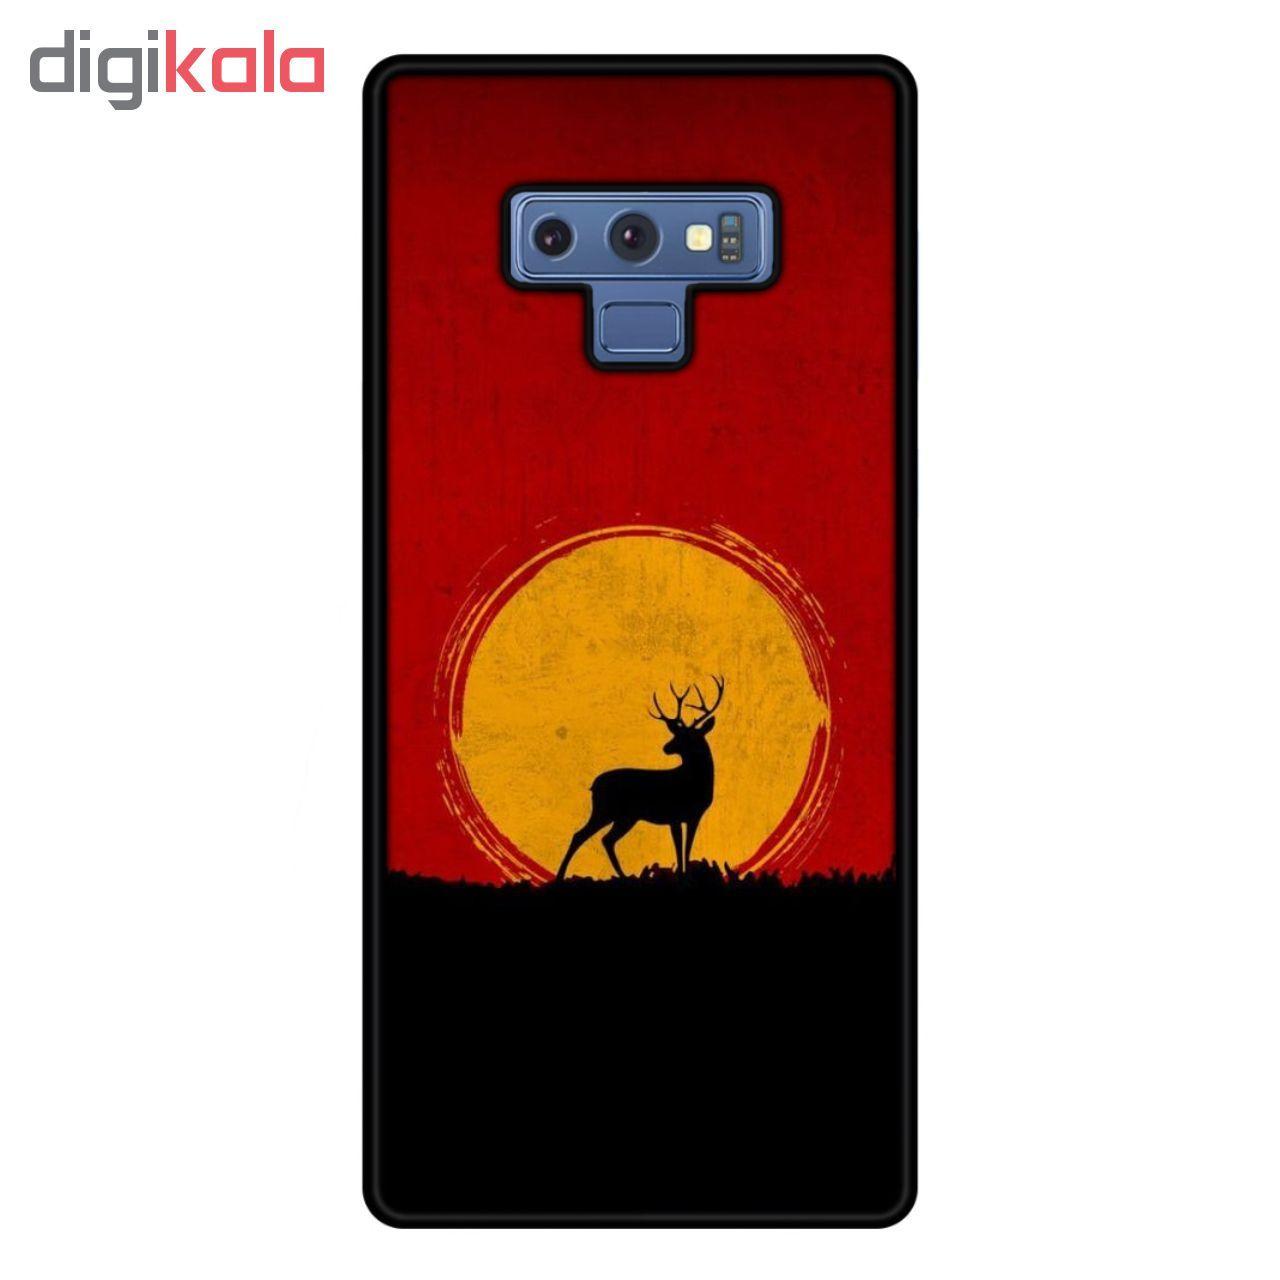 کاور آکام مدل AN91334 مناسب برای گوشی موبایل سامسونگ Galaxy Note 9 main 1 1